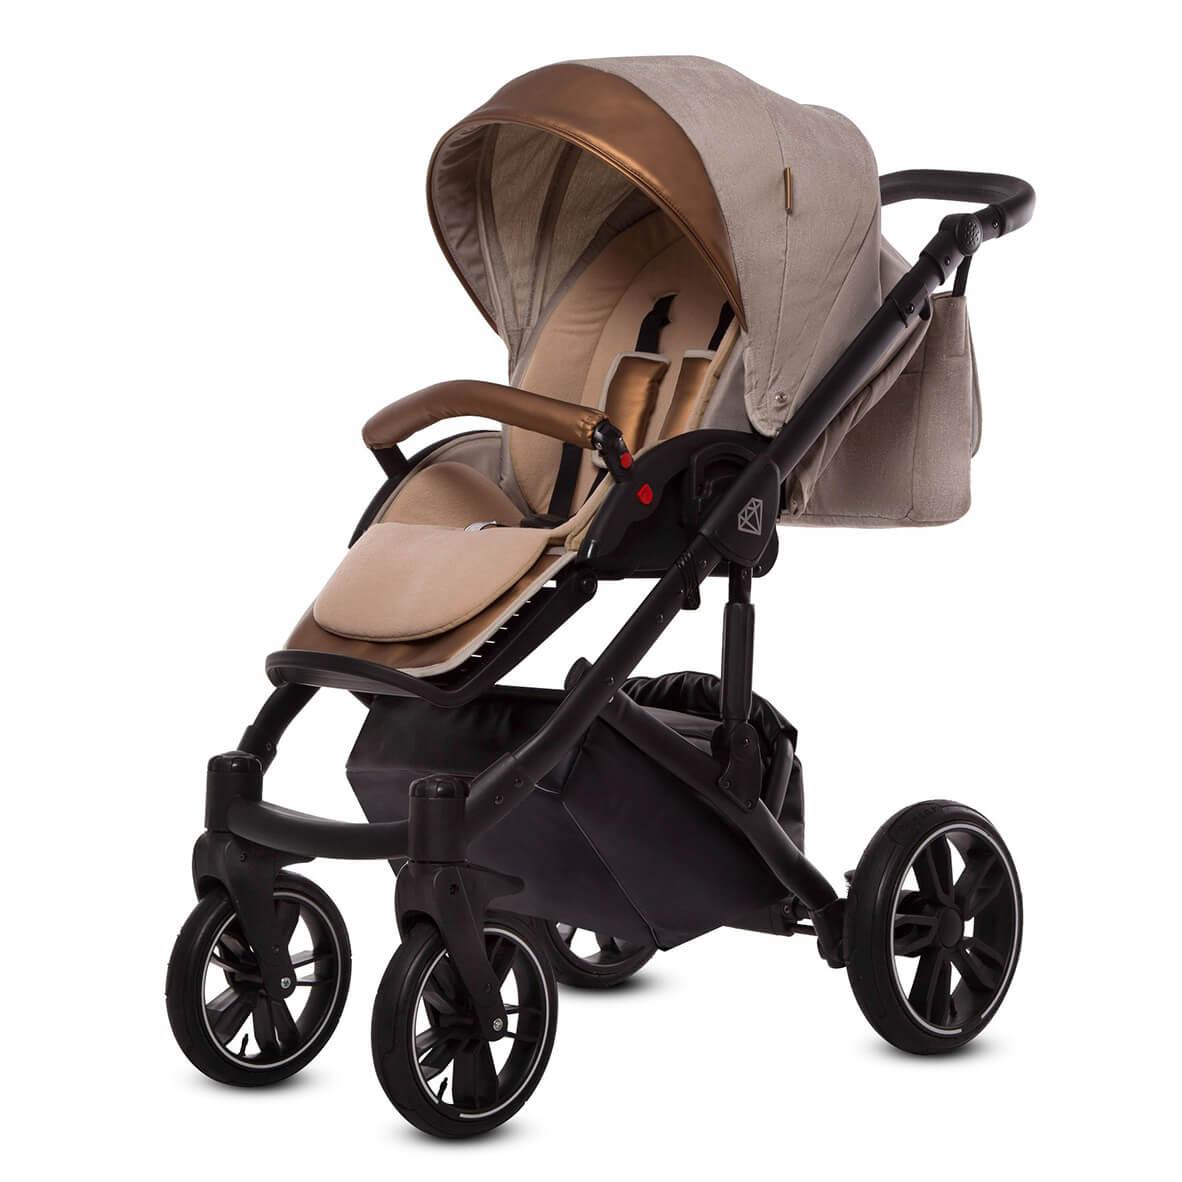 wersja spacerowa wózka babyactive chic